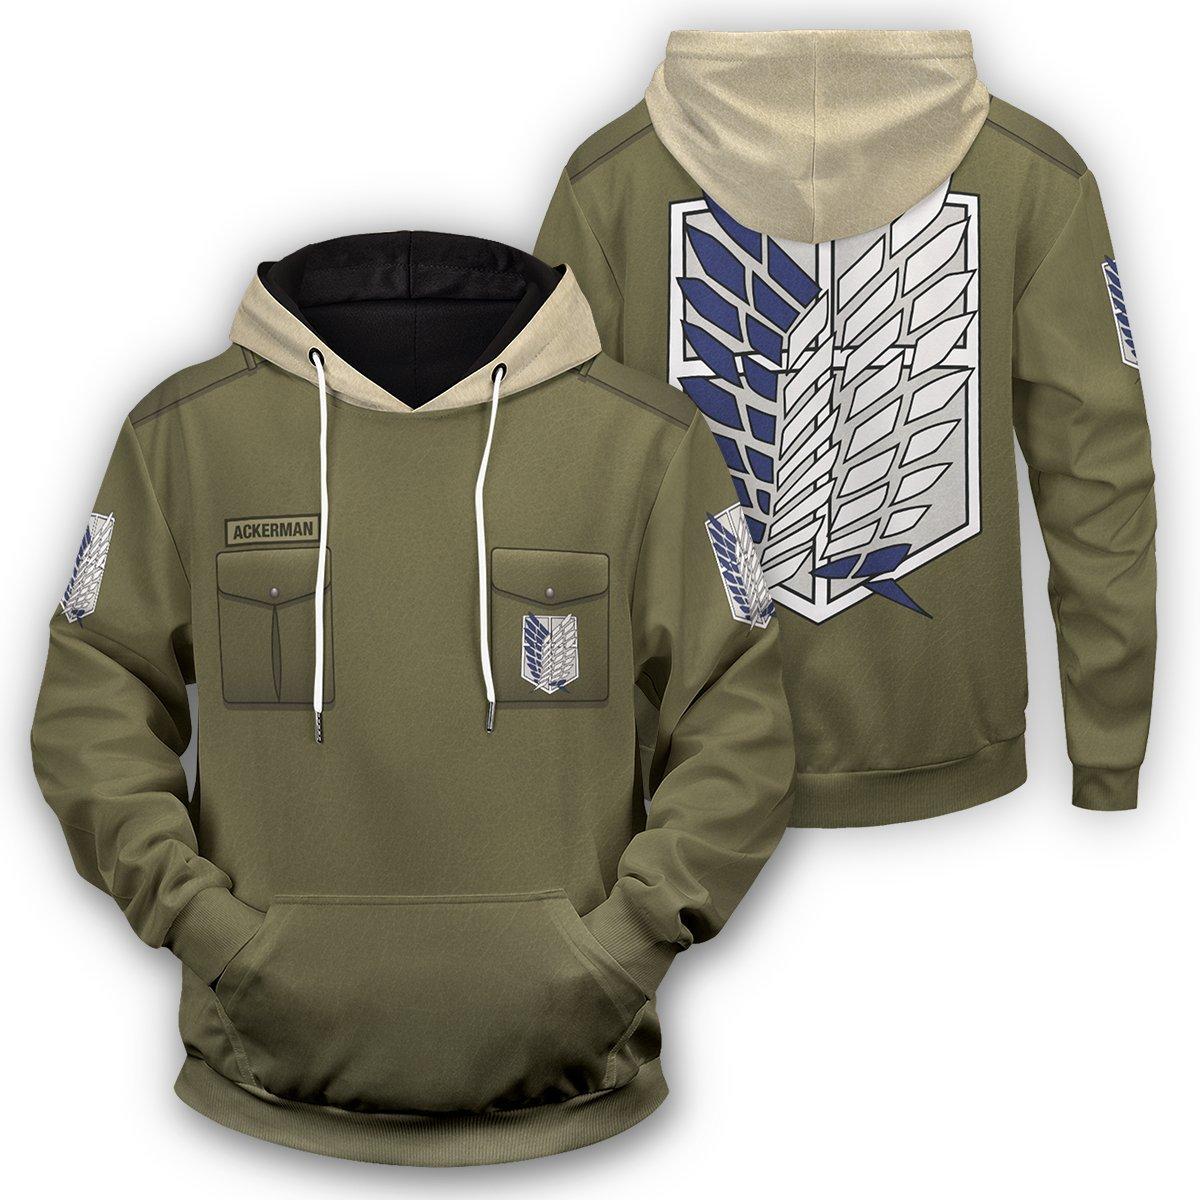 Personalized New Survey Corps Uniform Unisex Pullover Hoodie FDM3009 S Official Otaku Treat Merch